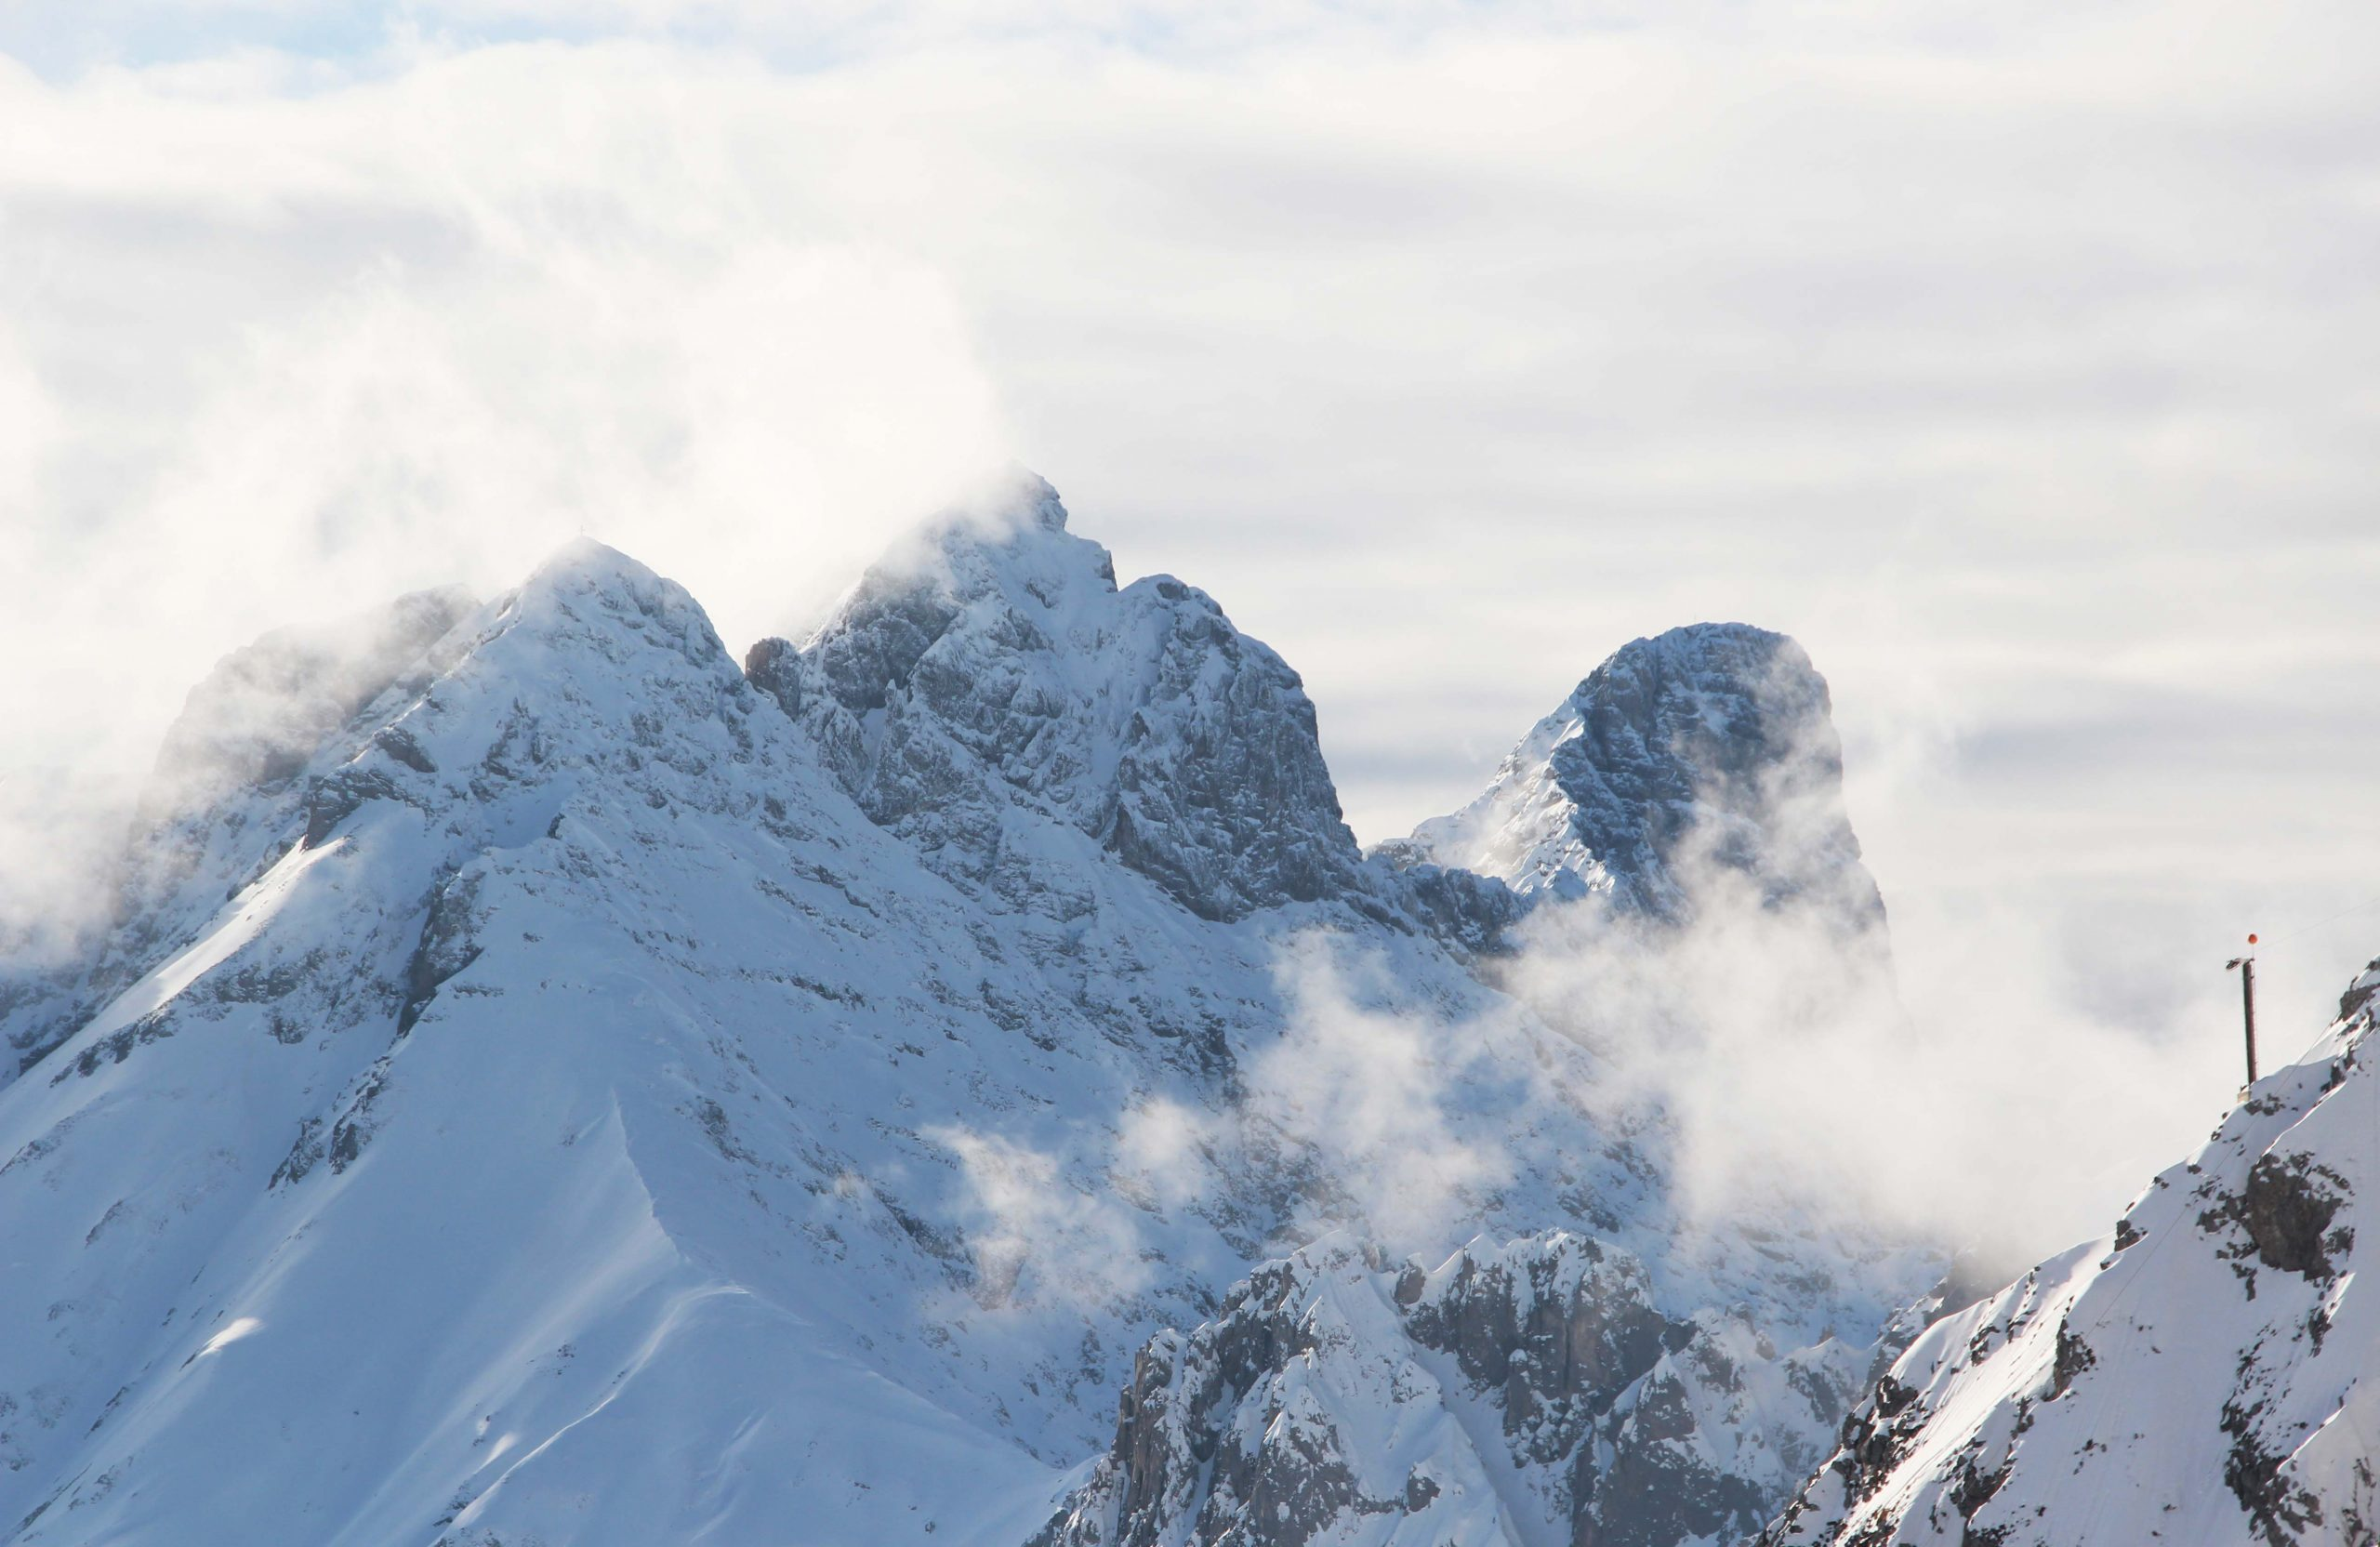 Riedz_Absteige_Apartments_Innsbruck_Tirol_Austria_Alps_Holiday_Sports_Accommodation02_WEB_2013